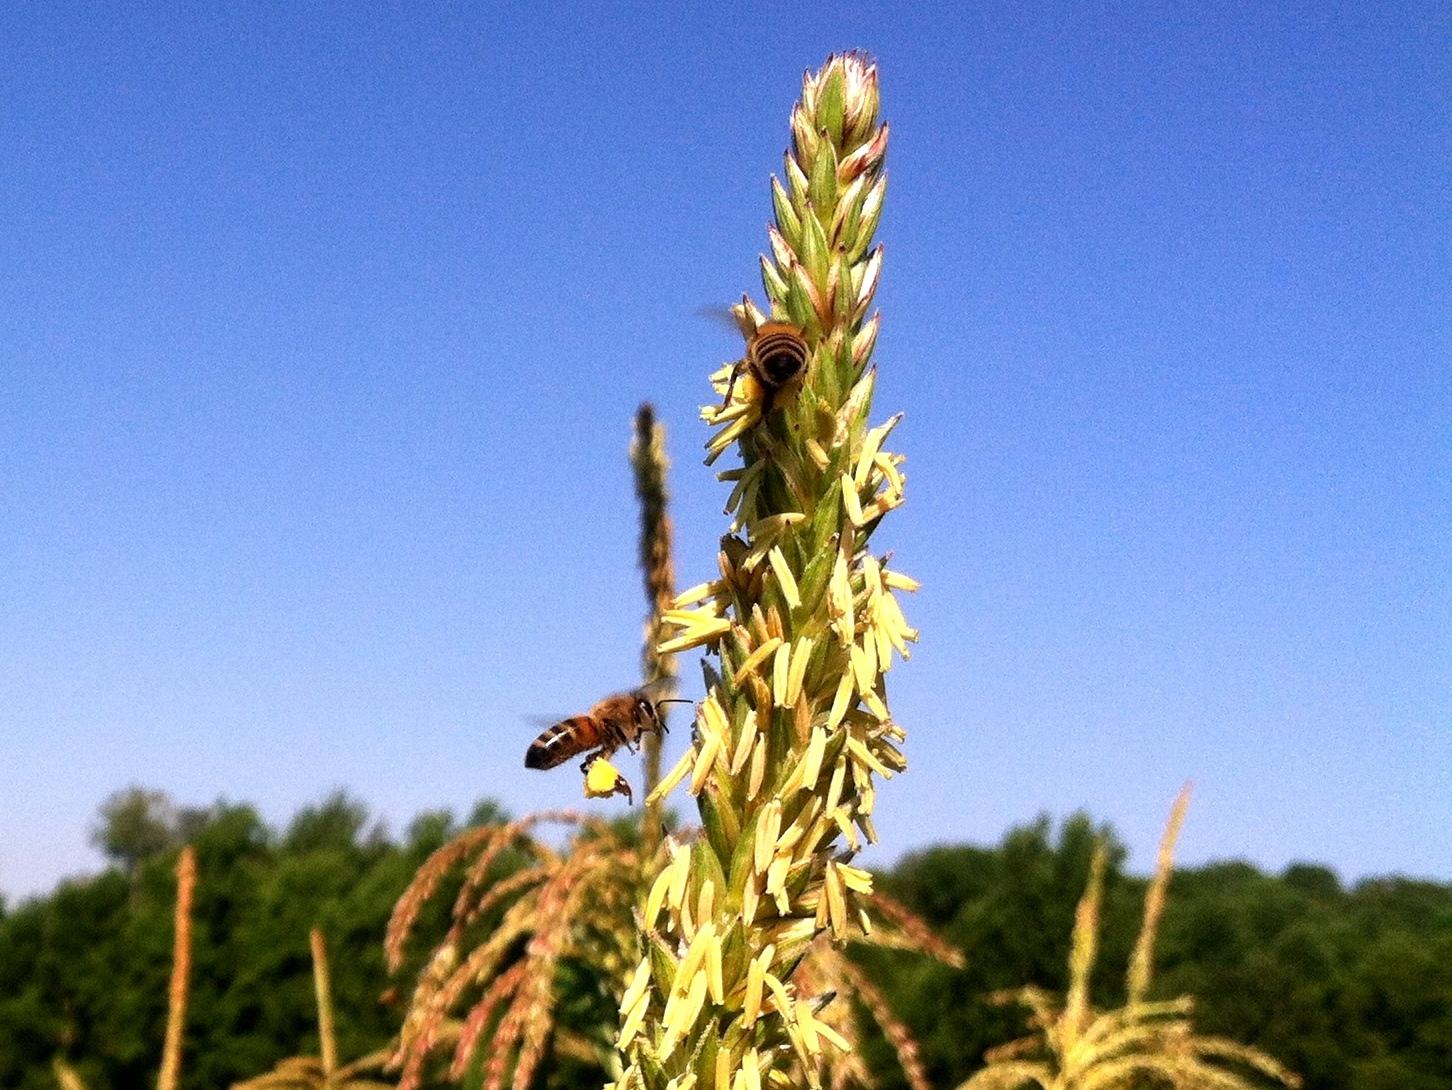 The honeybees fill their pollen baskets as the popcorn tassels.